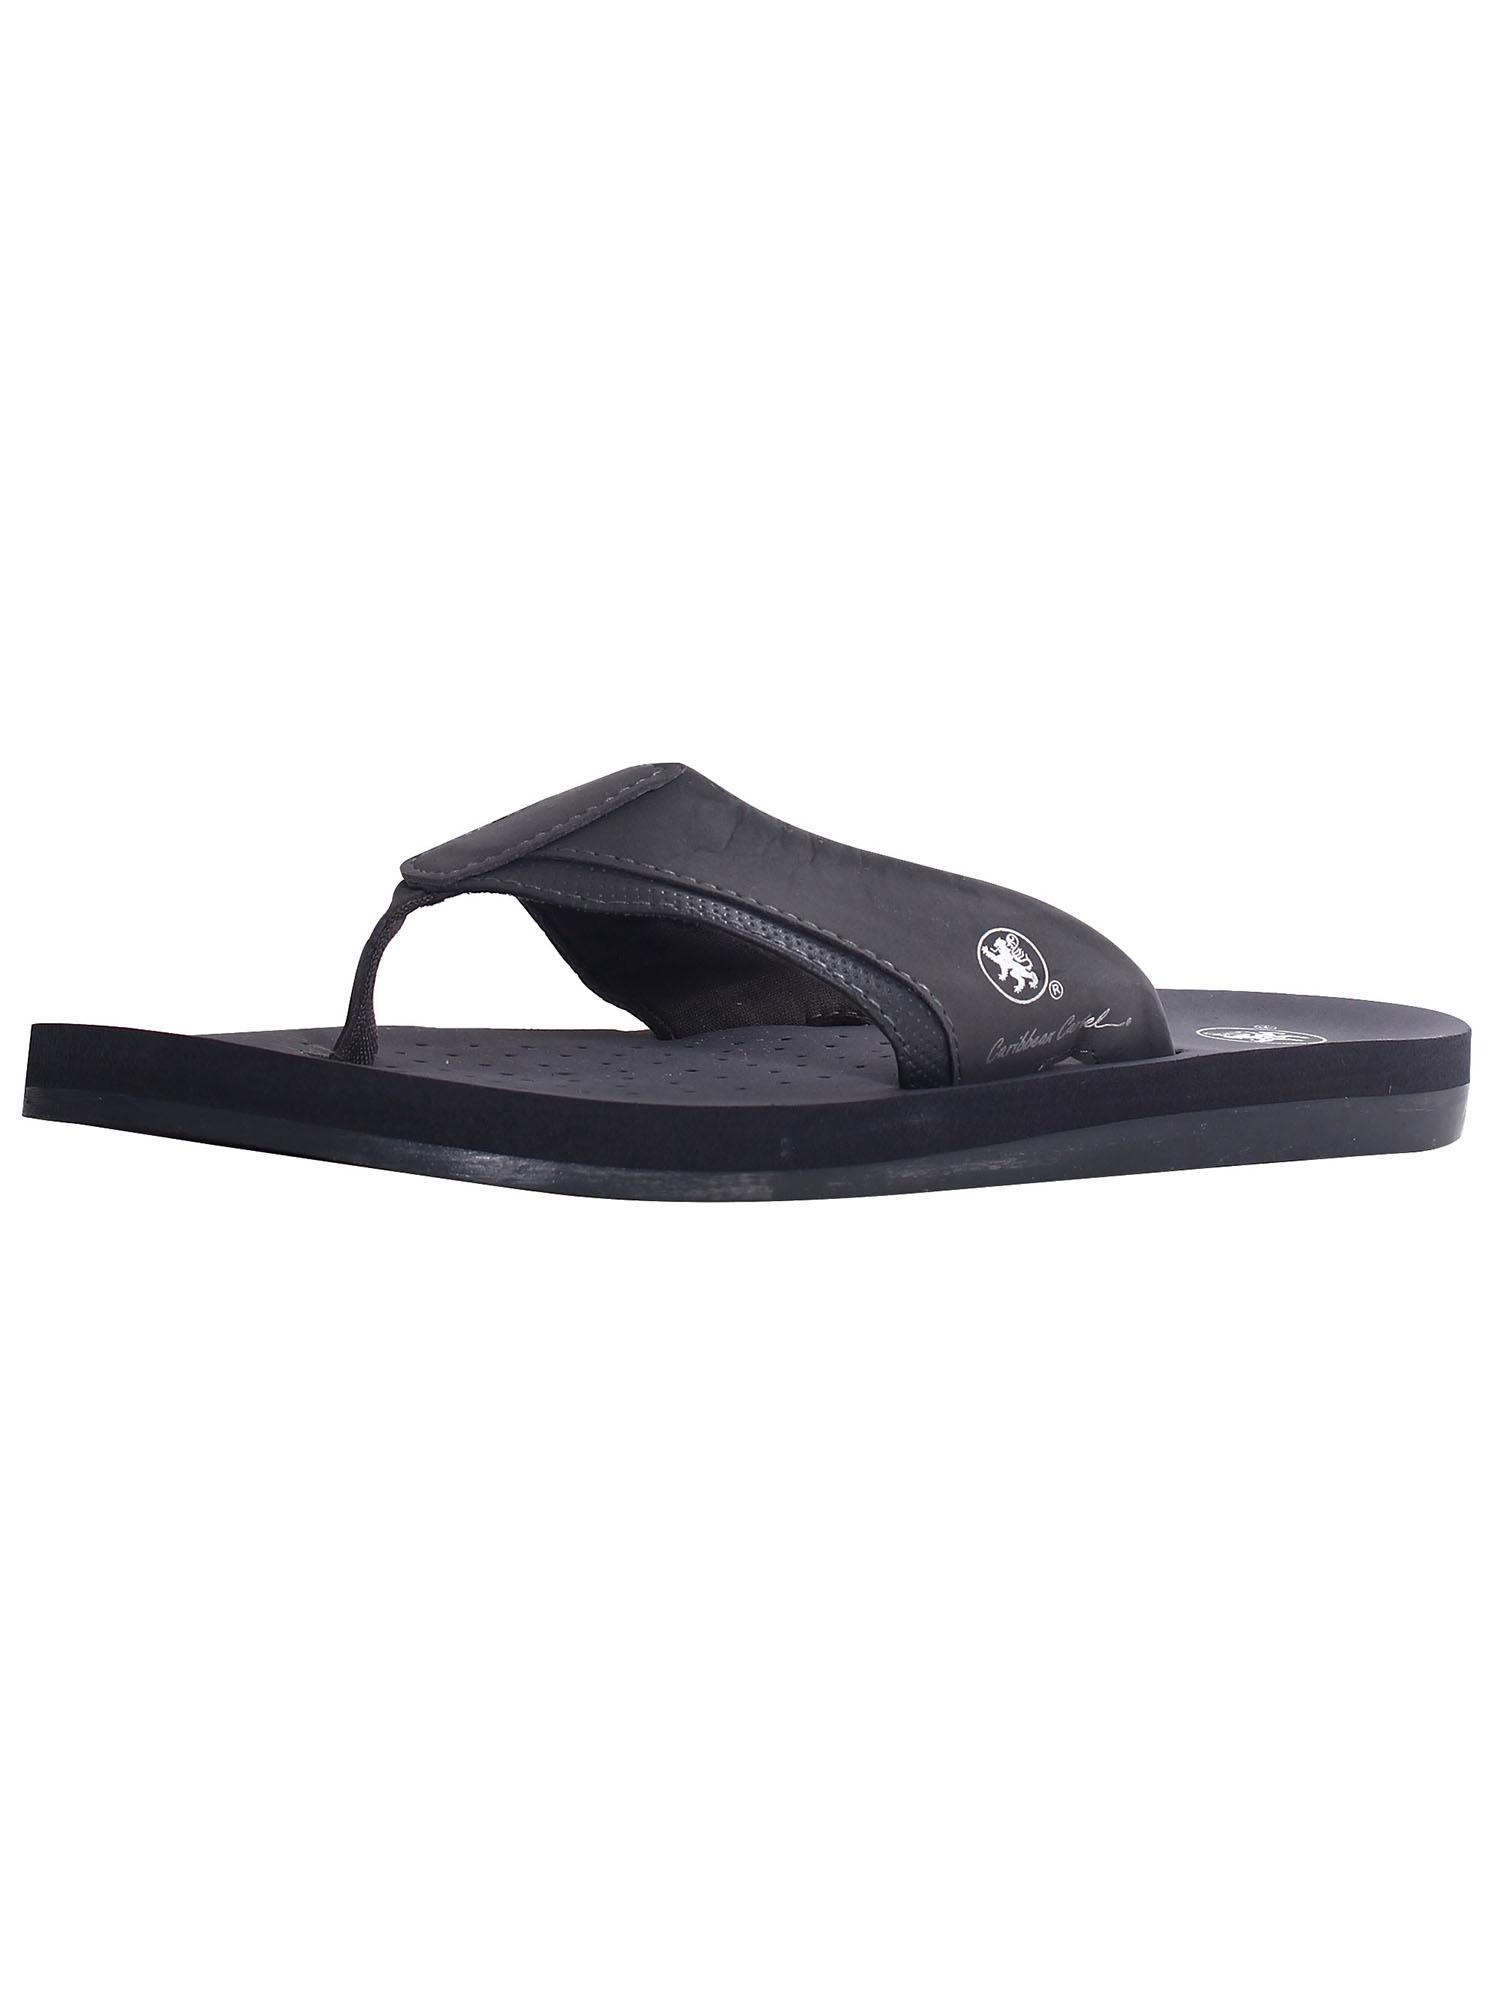 Men's Comfort Strap Poolside Beach Flip Flop Sandals, 5577M_Grey, 12(Medium)